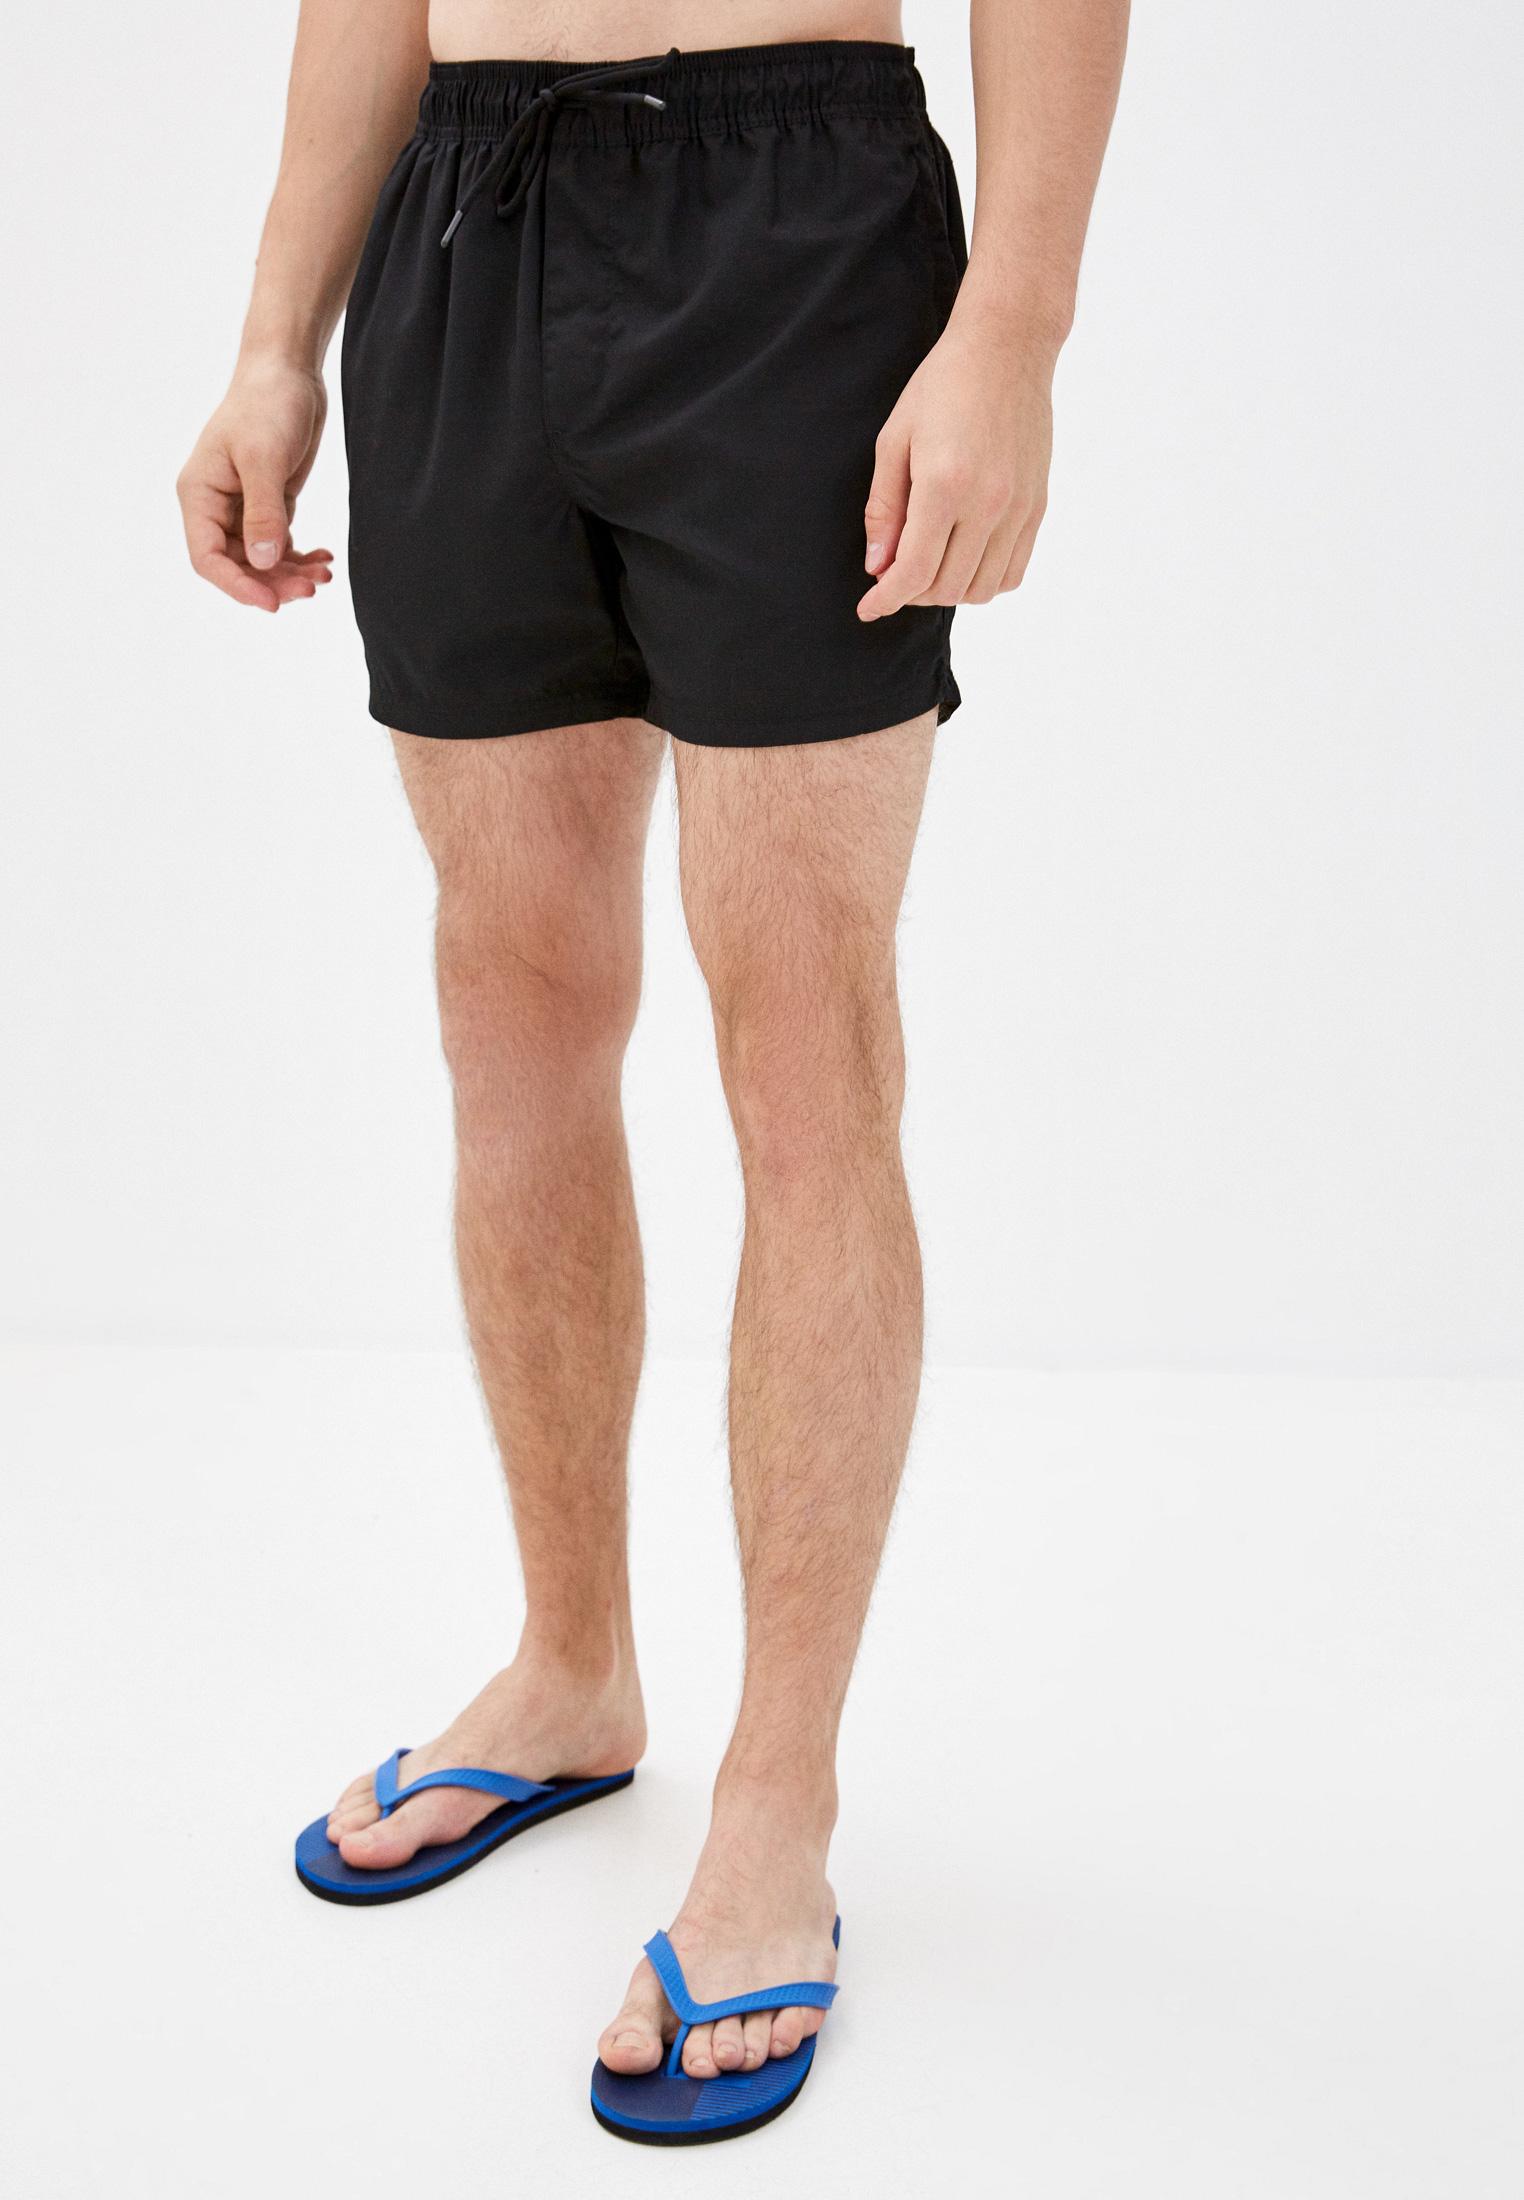 Мужские шорты для плавания Cotton On 351066-234